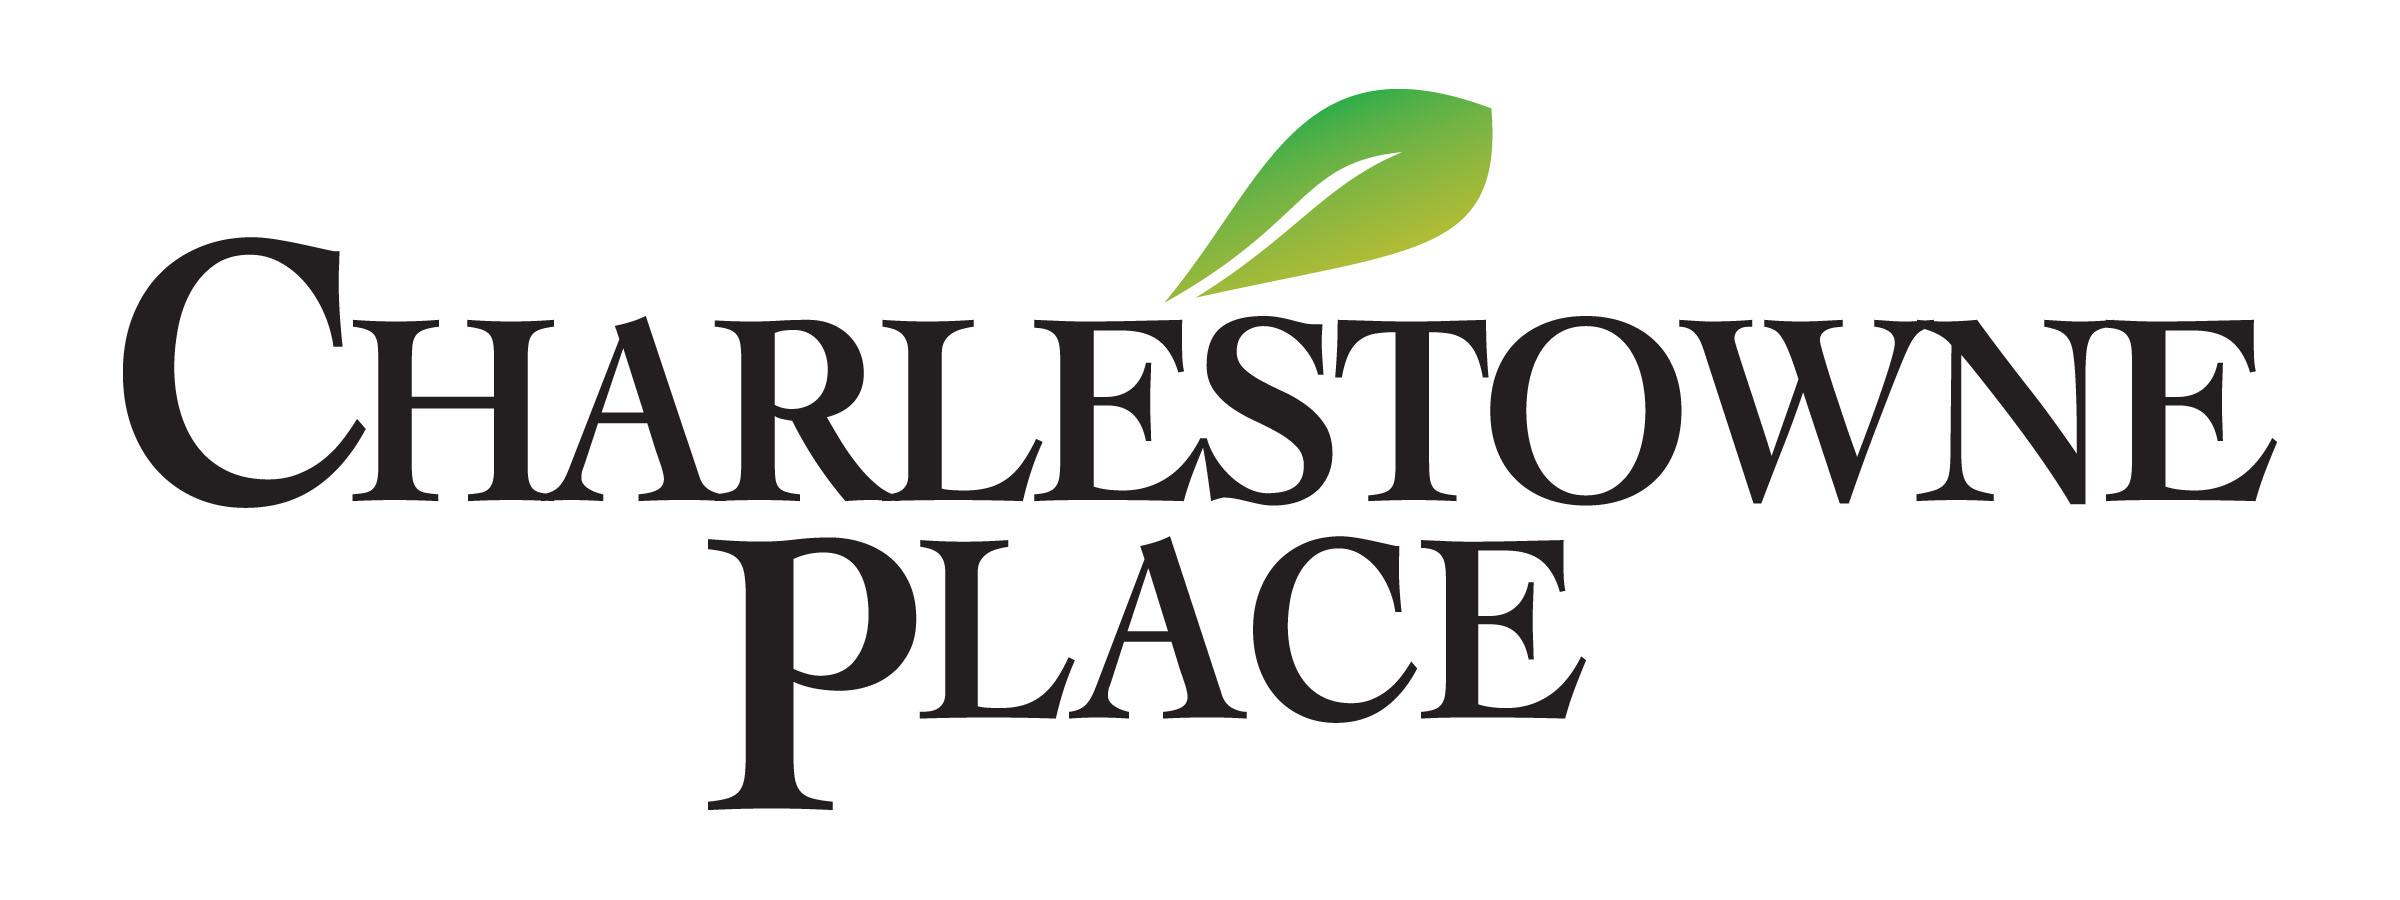 Charlestowne Place logo